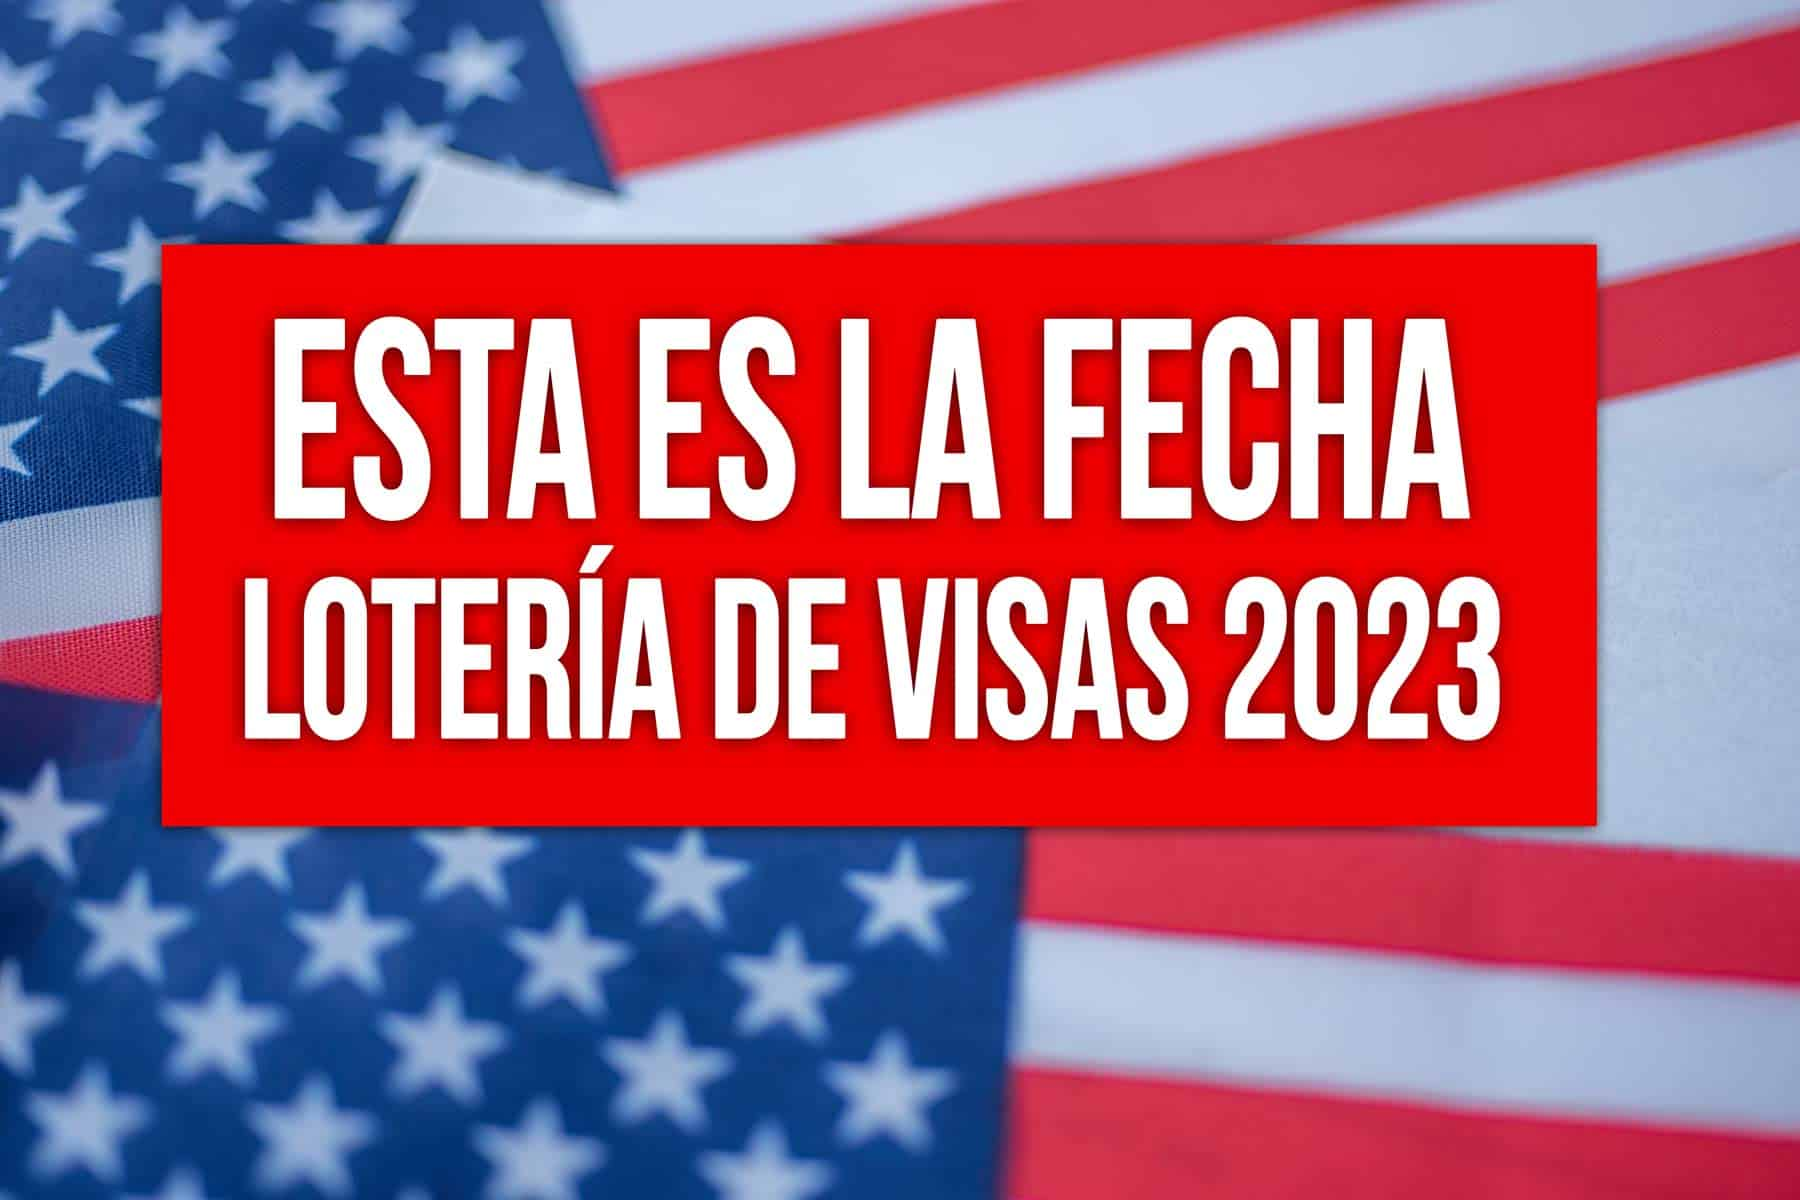 fecha loteria de visas 2023